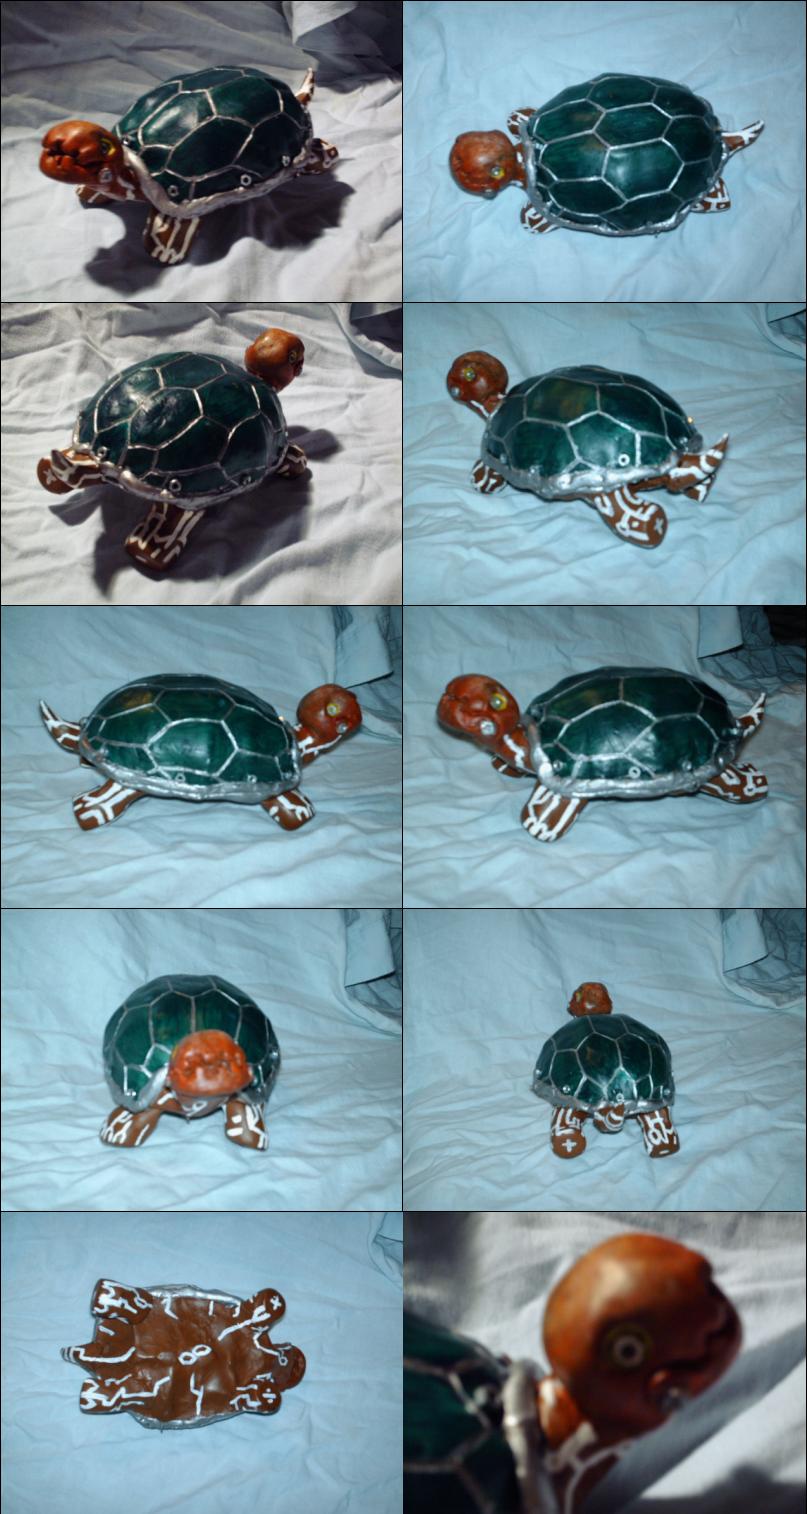 Robot Turtle sculpture by Spartichi